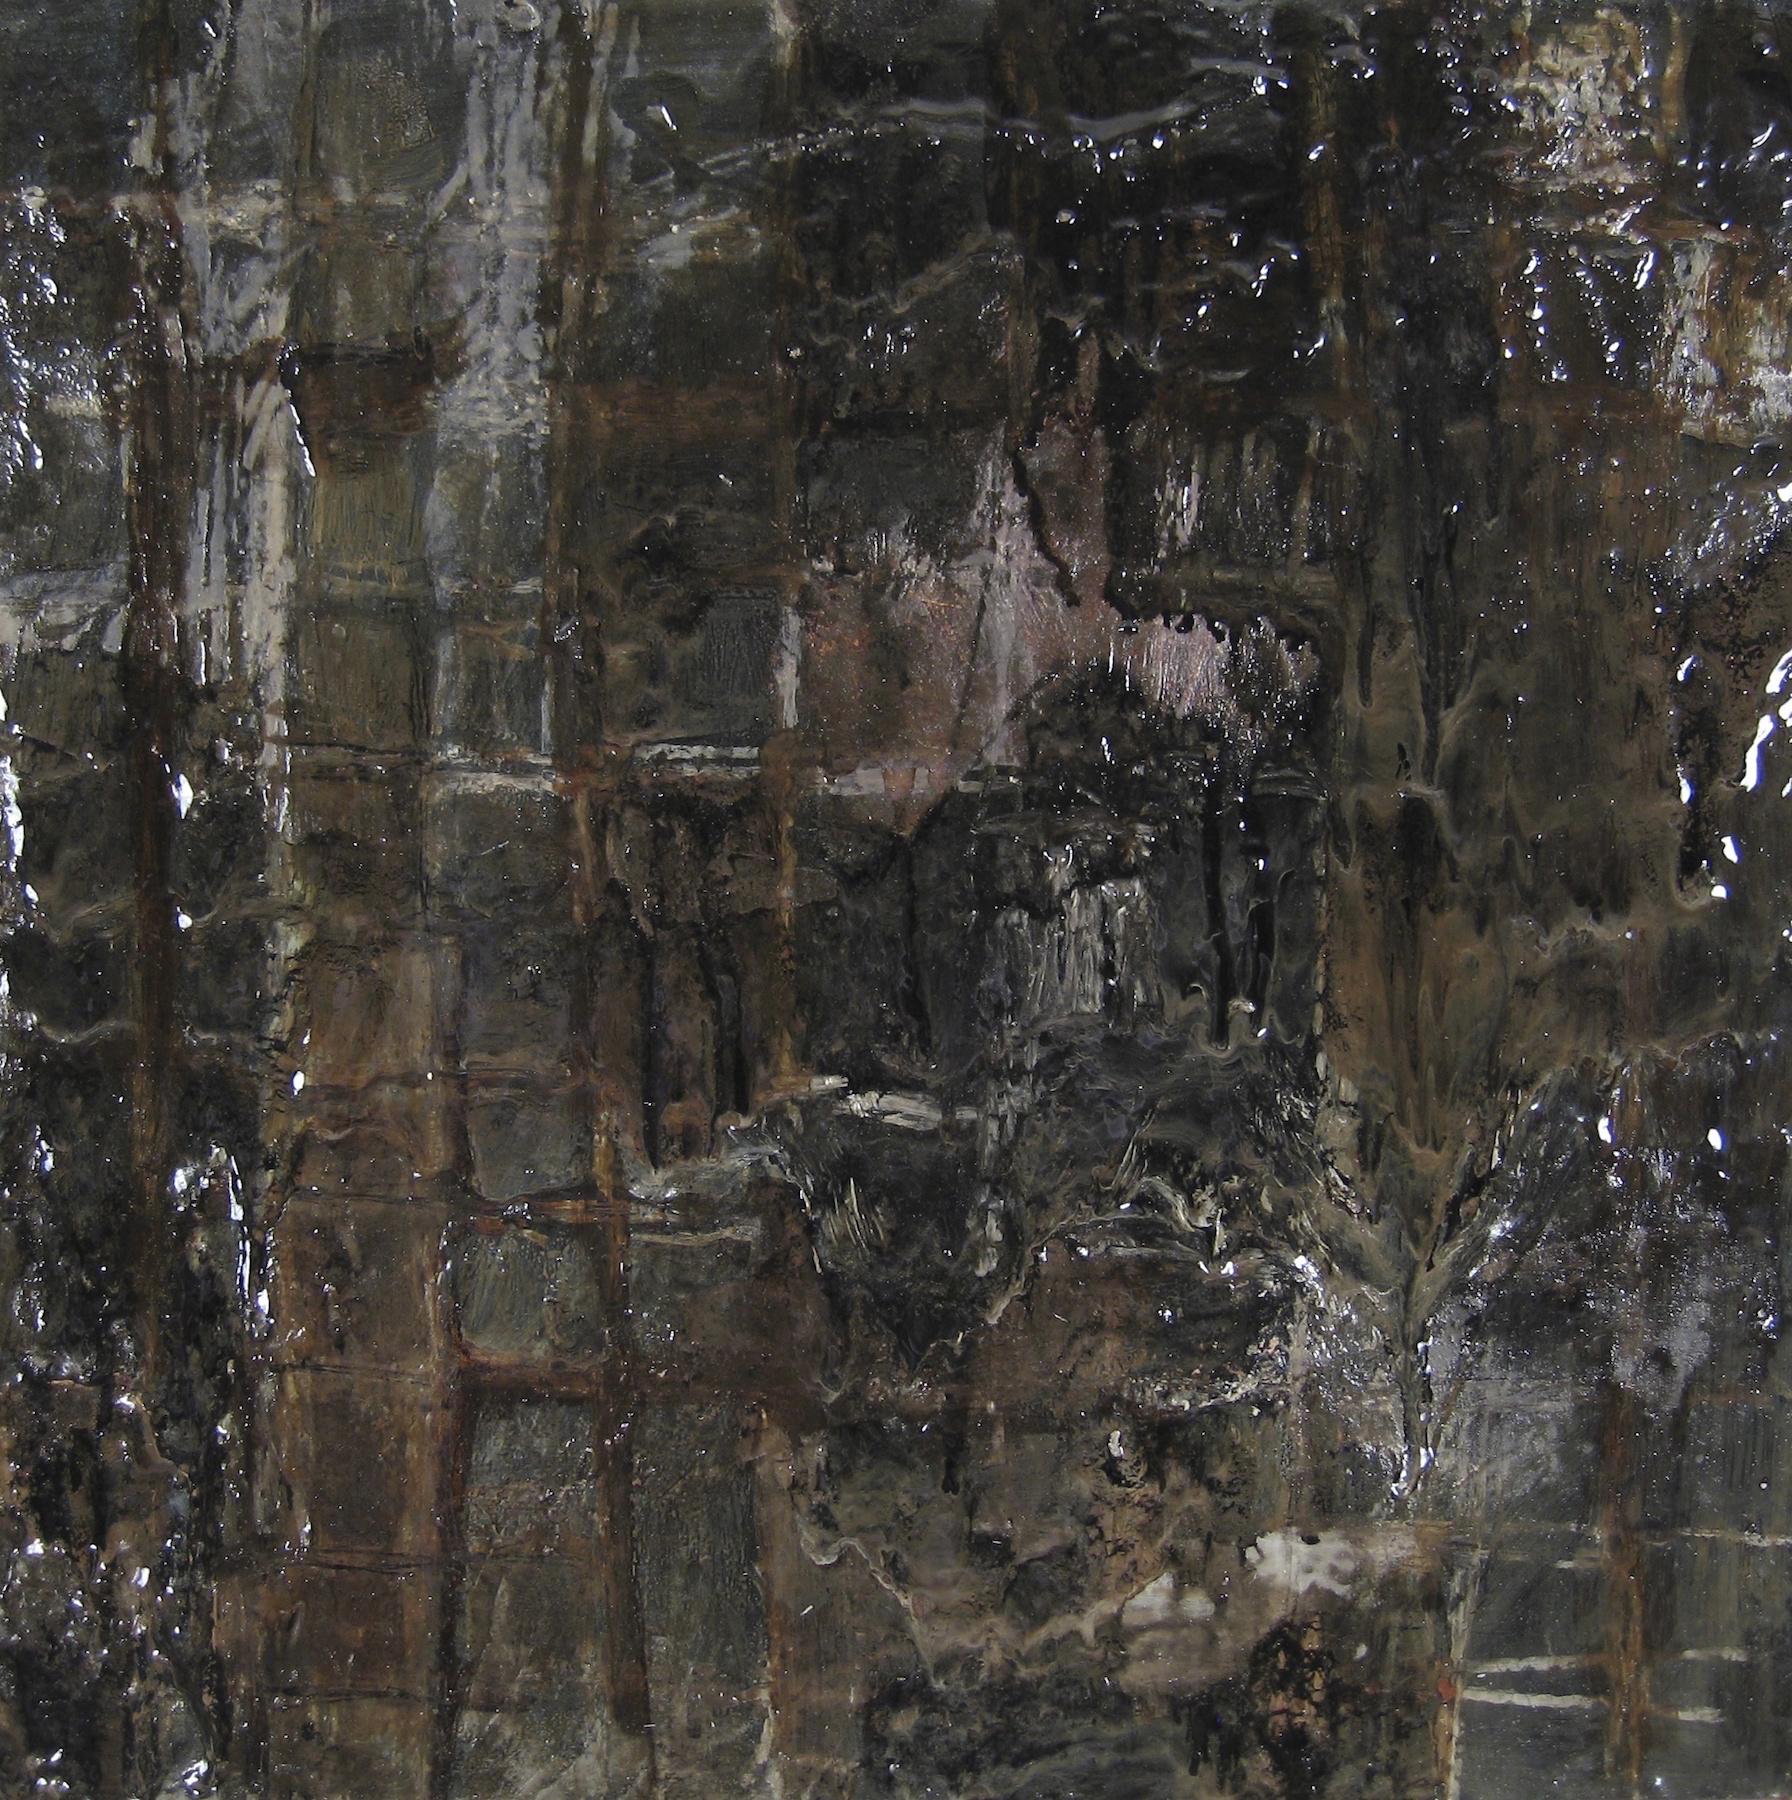 Leslie Zelamsky, Musak: Screen, mixed media, 16x16, $900   SOLD